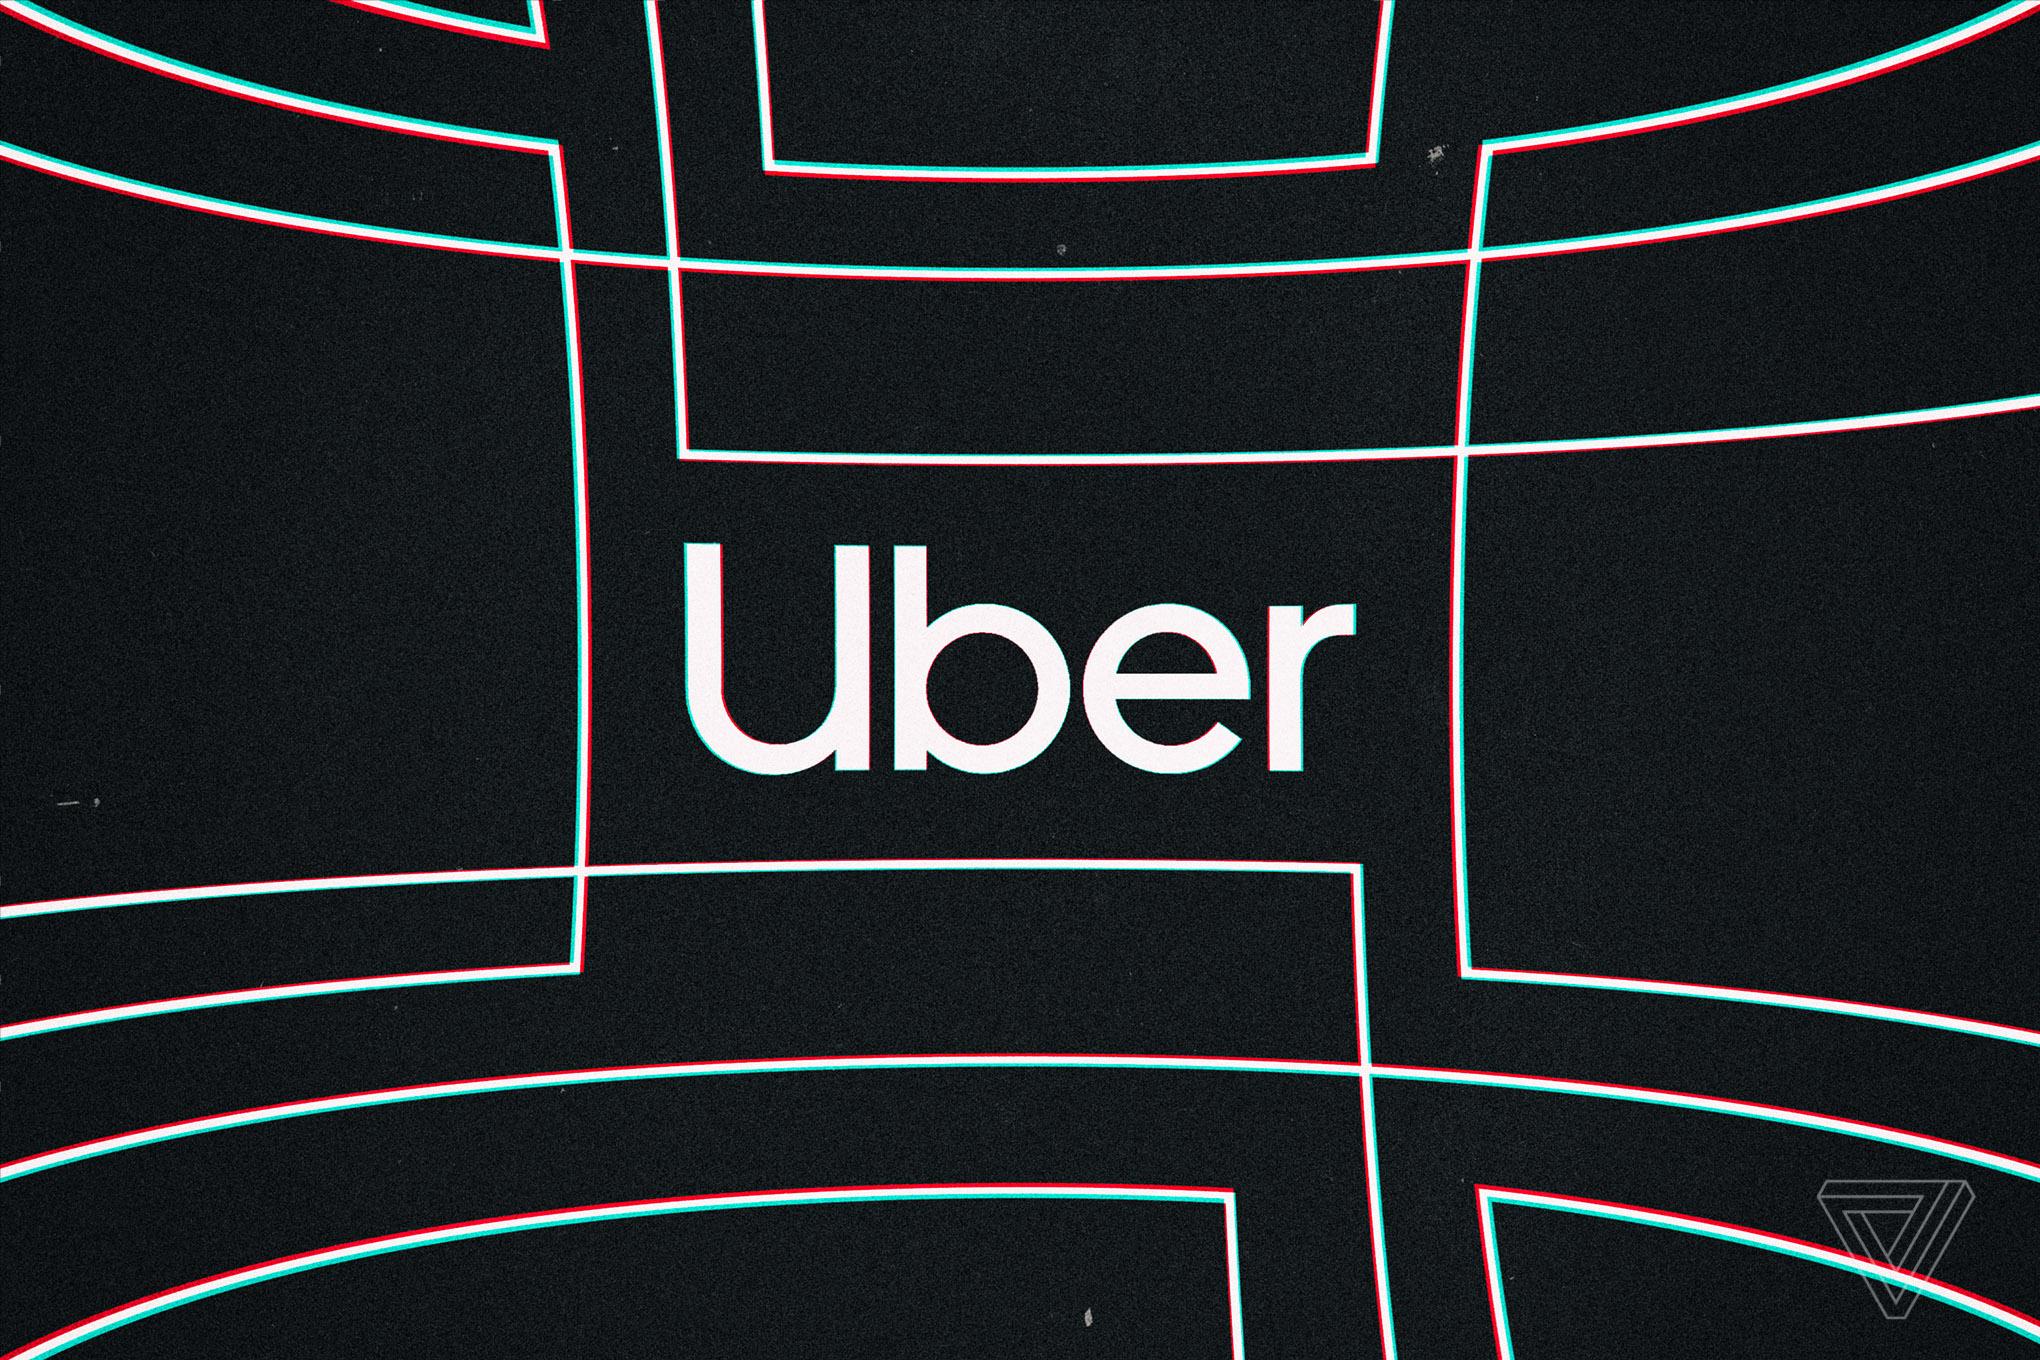 Uber - The Verge